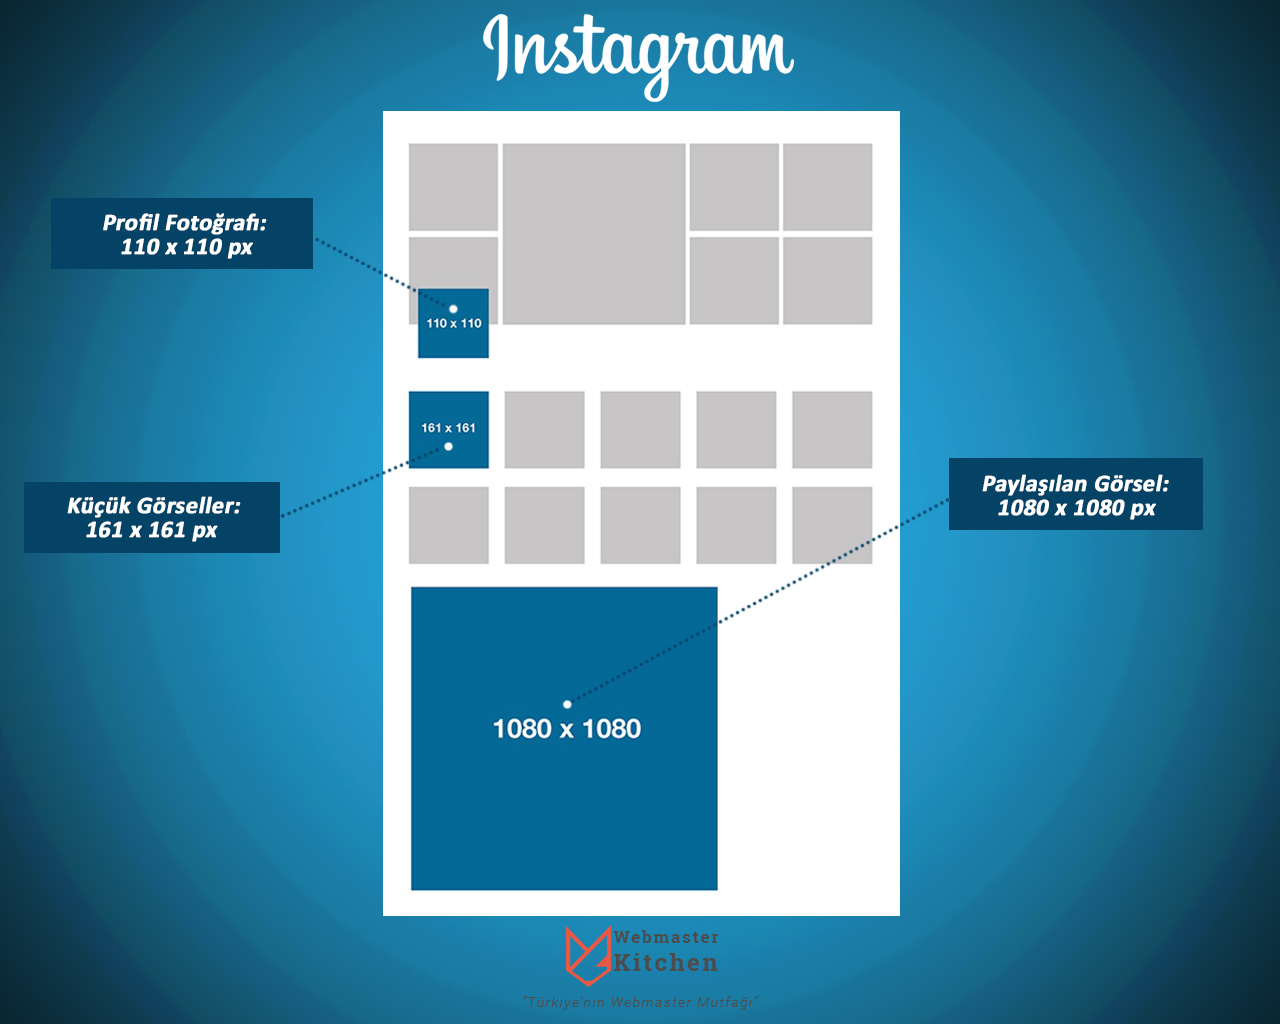 Размер разрешение фото в инстаграм